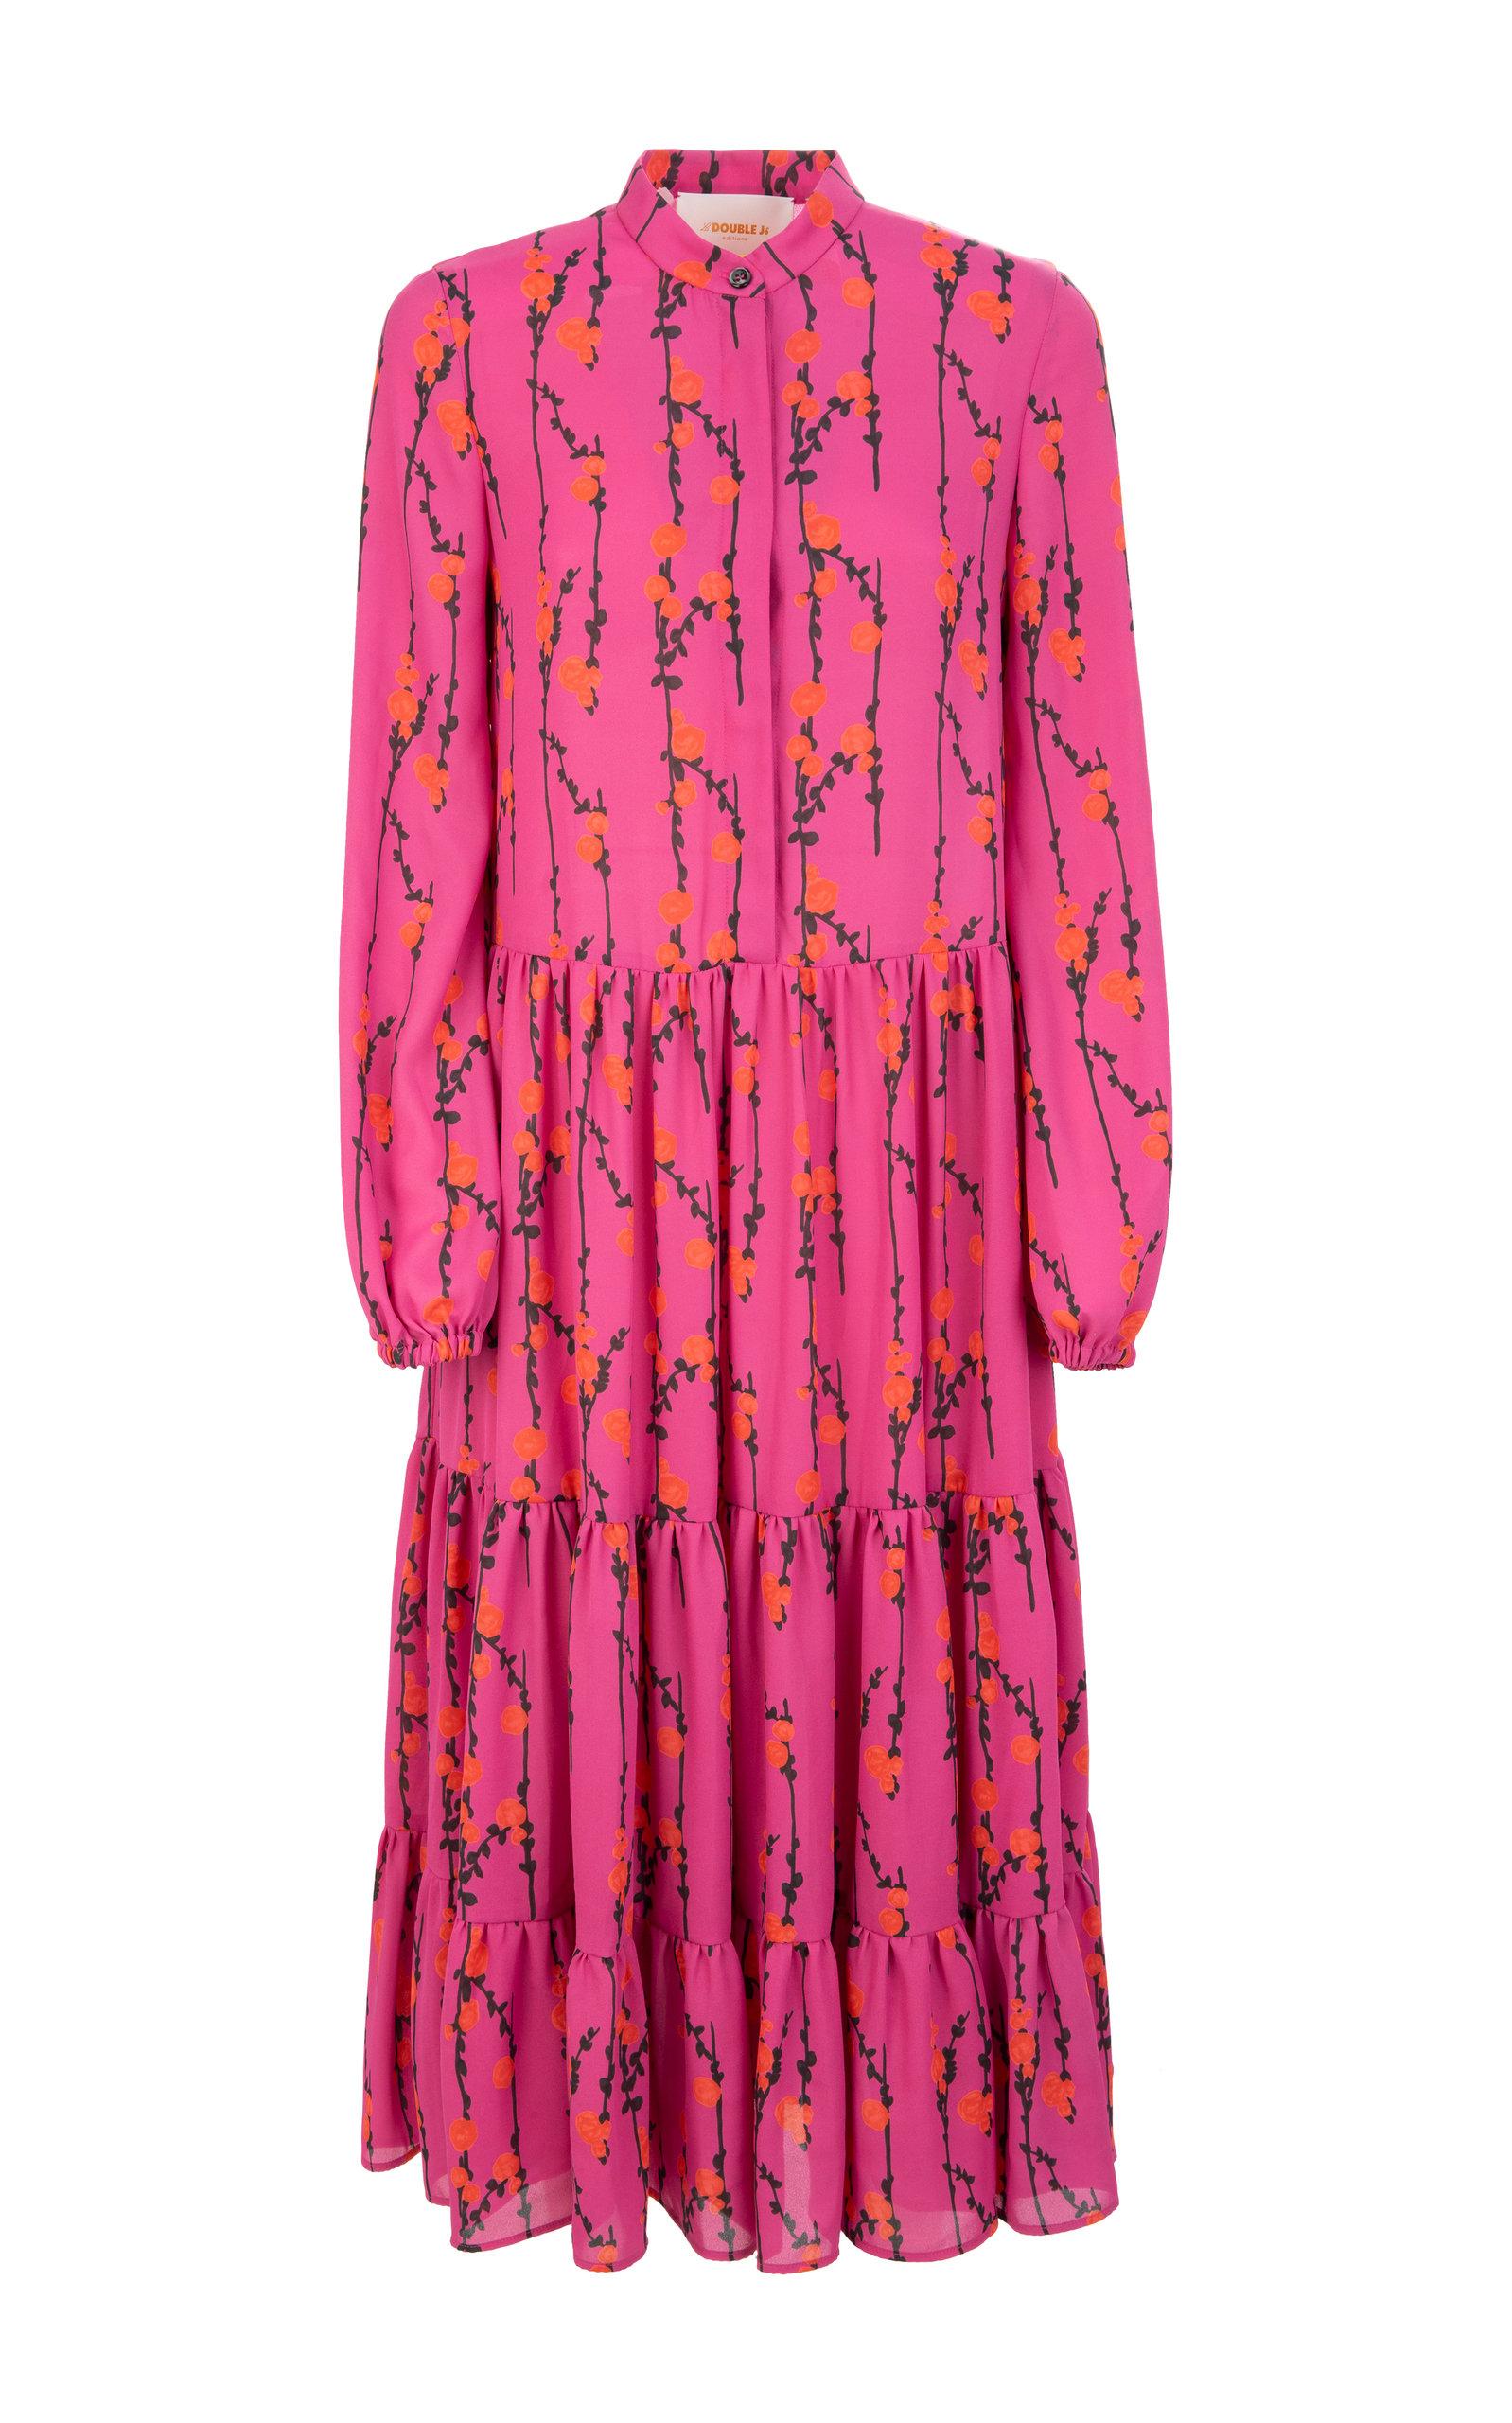 Buy La DoubleJ Floral-Print Crepe Midi Dress online, shop La DoubleJ at the best price